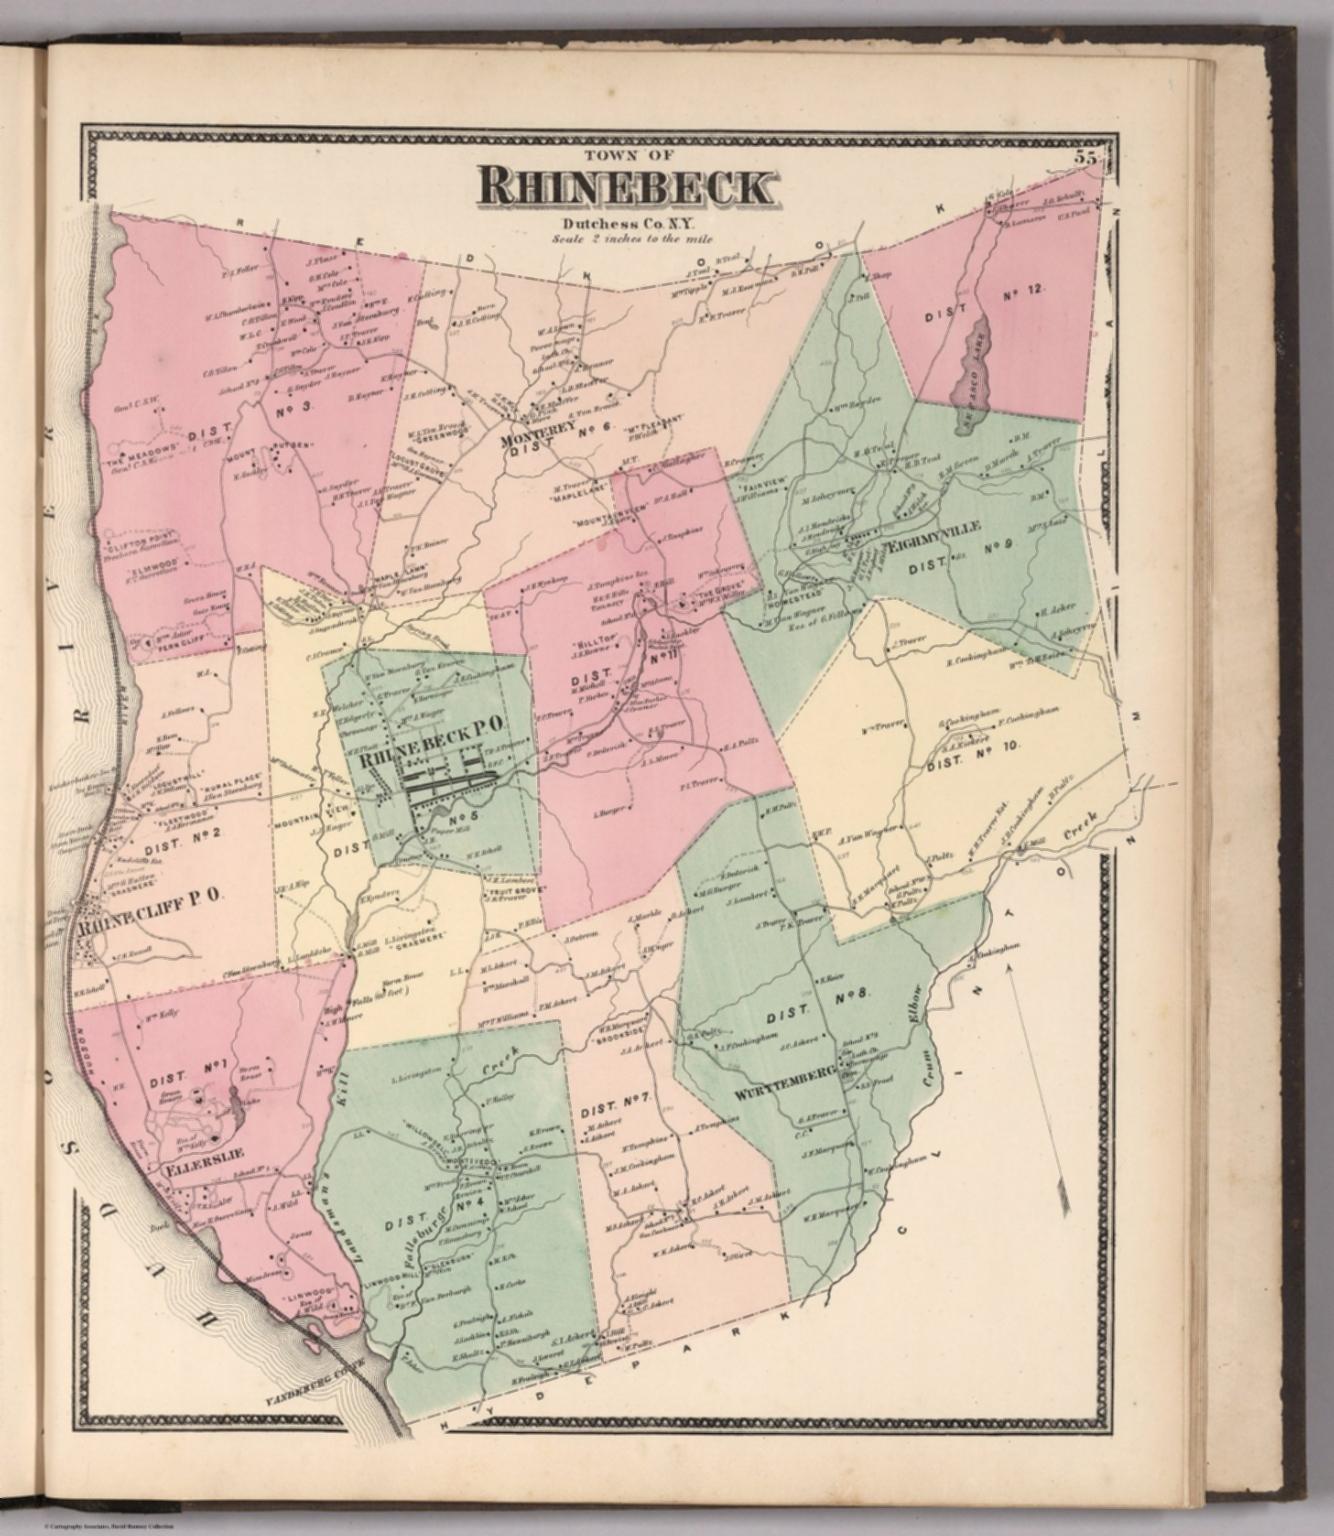 Town of Rhinebeck, Dutchess County, New York. - David Rumsey ...